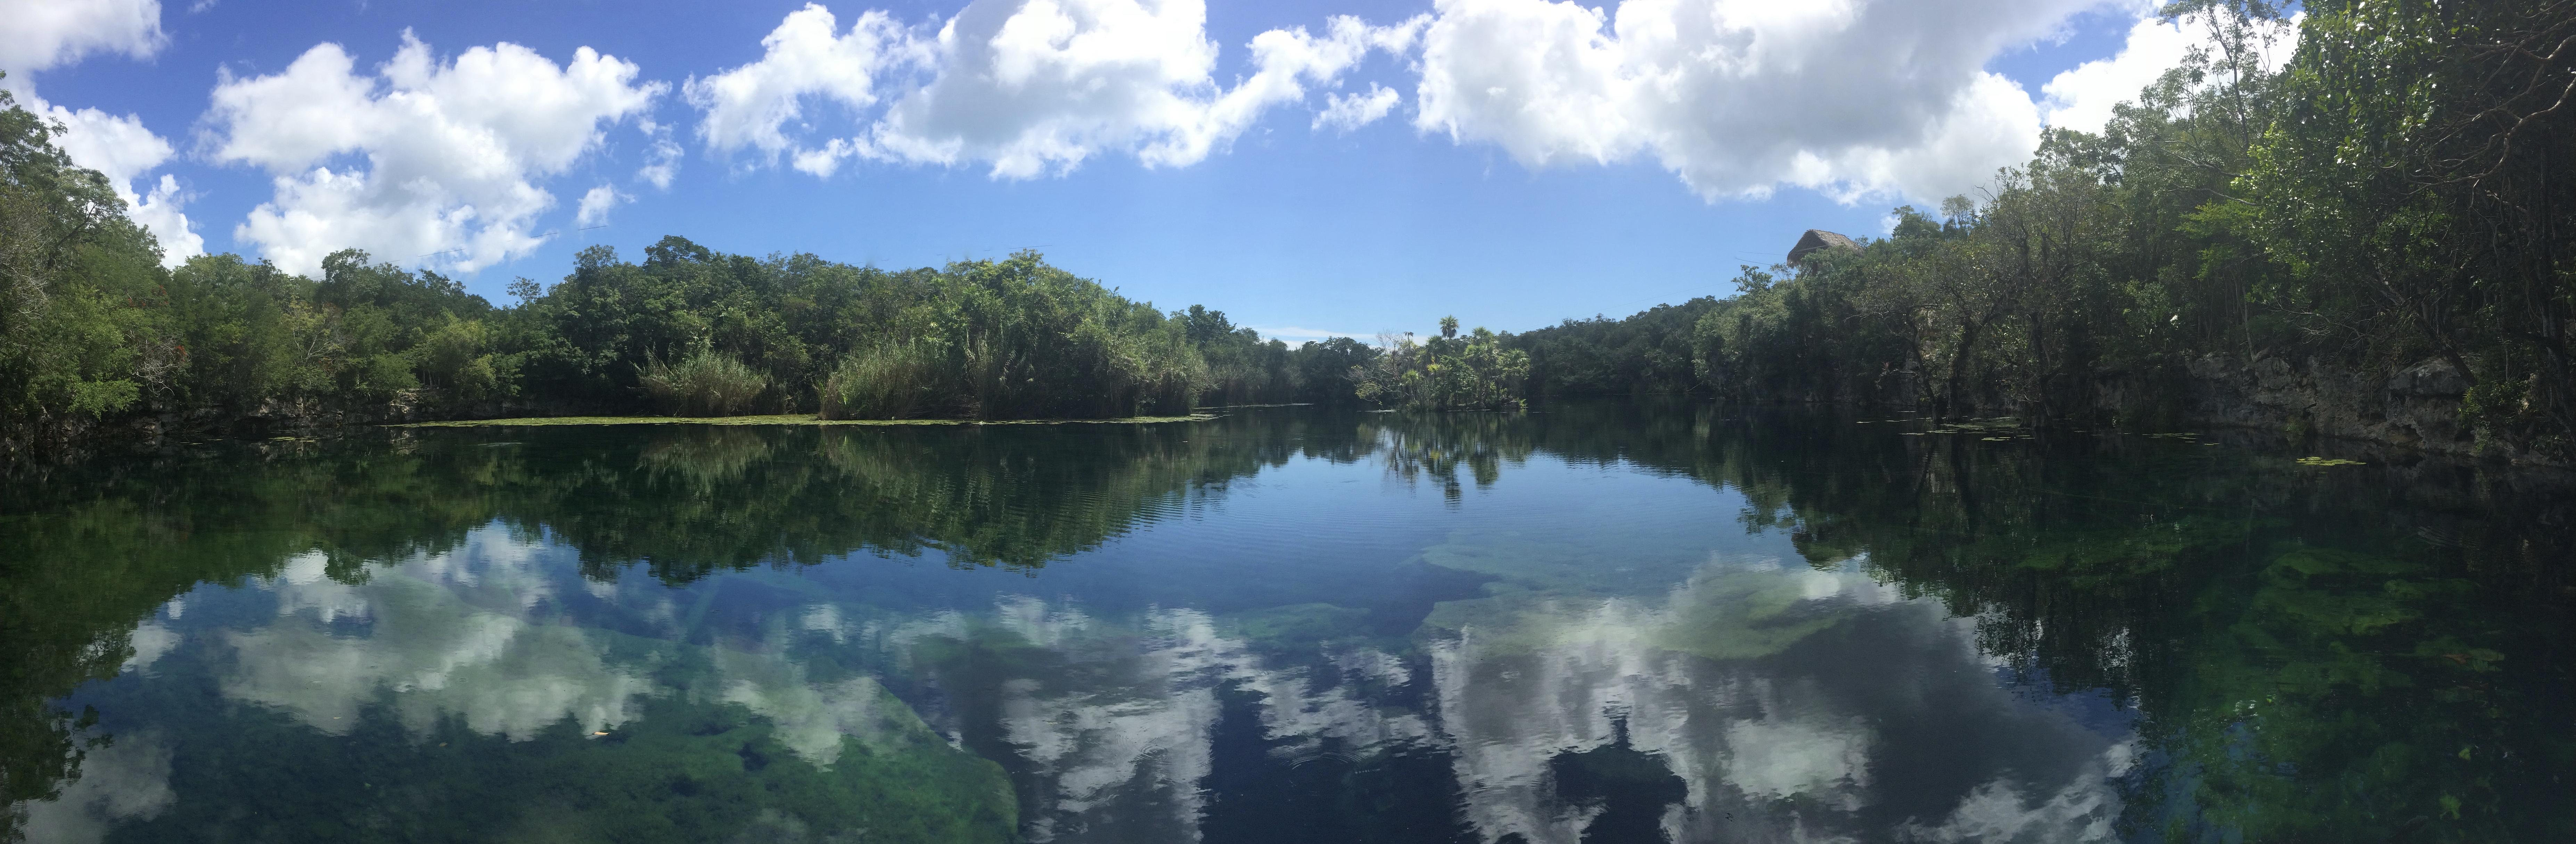 Cenote tankah